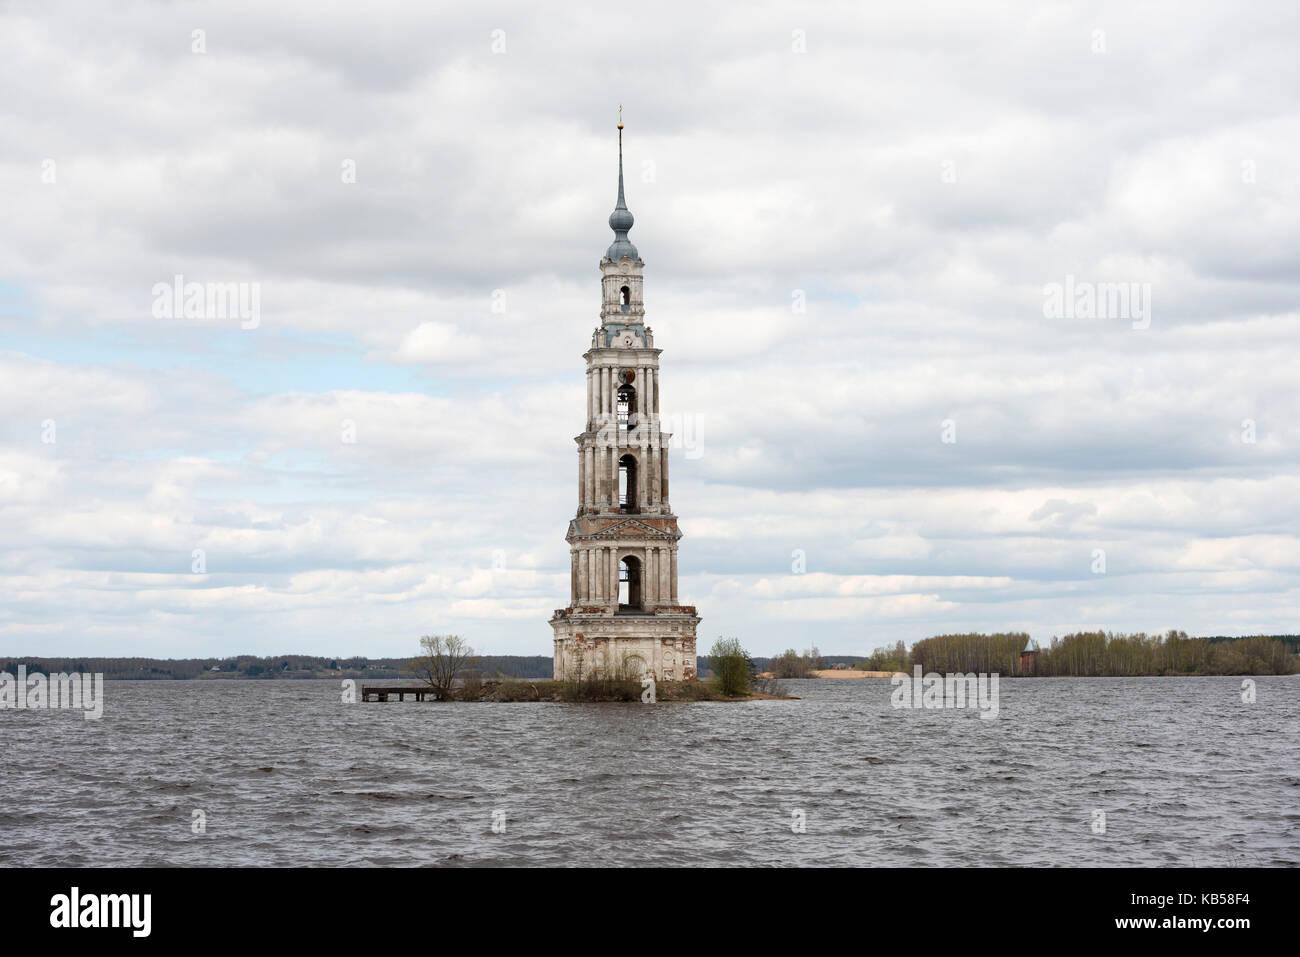 Russia, Kalyazin, Bell Tower, belfry, submerge, historic, water - Stock Image